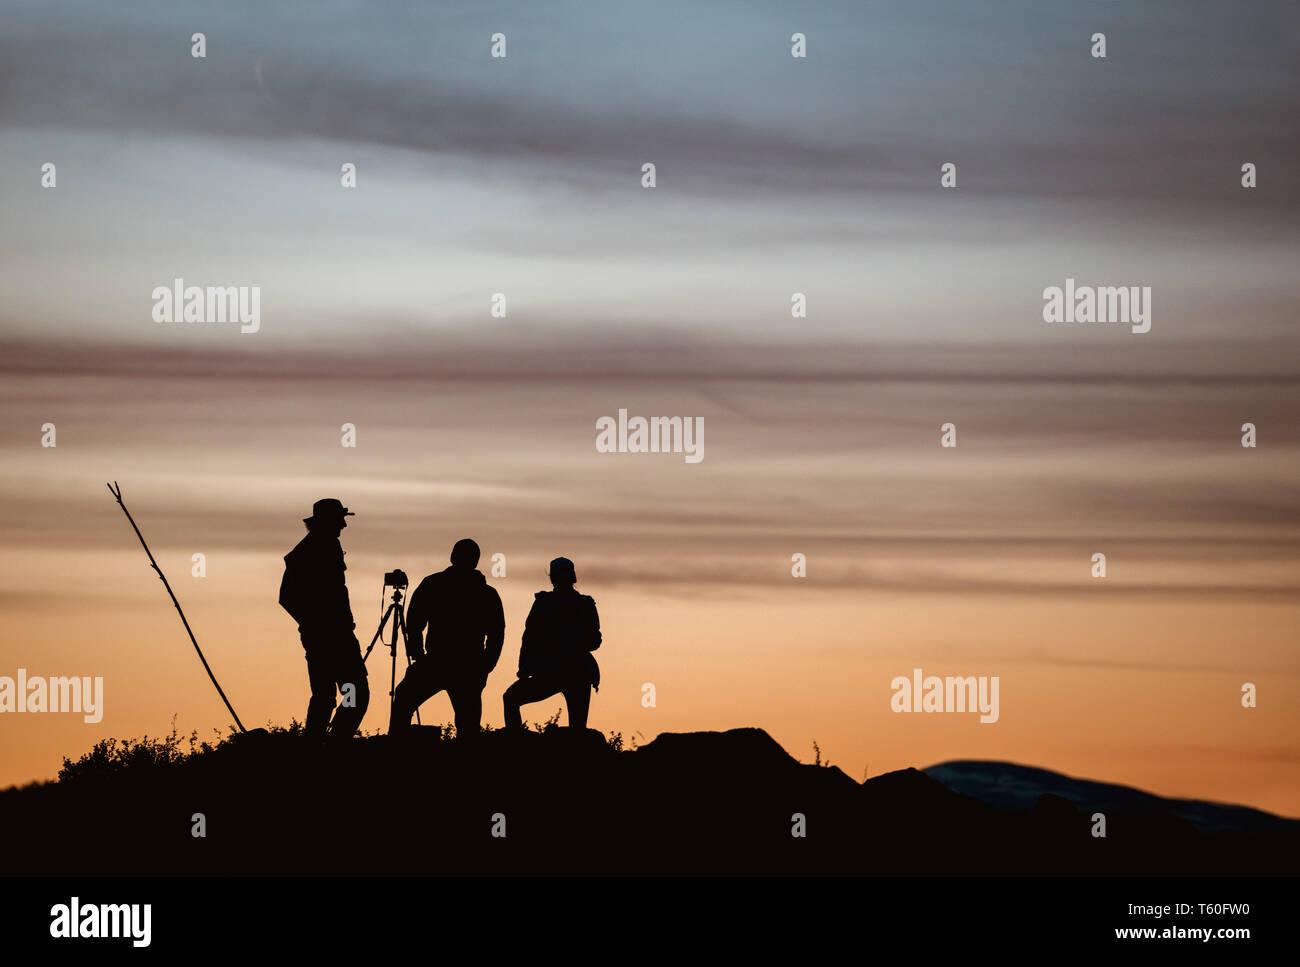 Group of three photographers taking photo against sunset sky Stock Photo